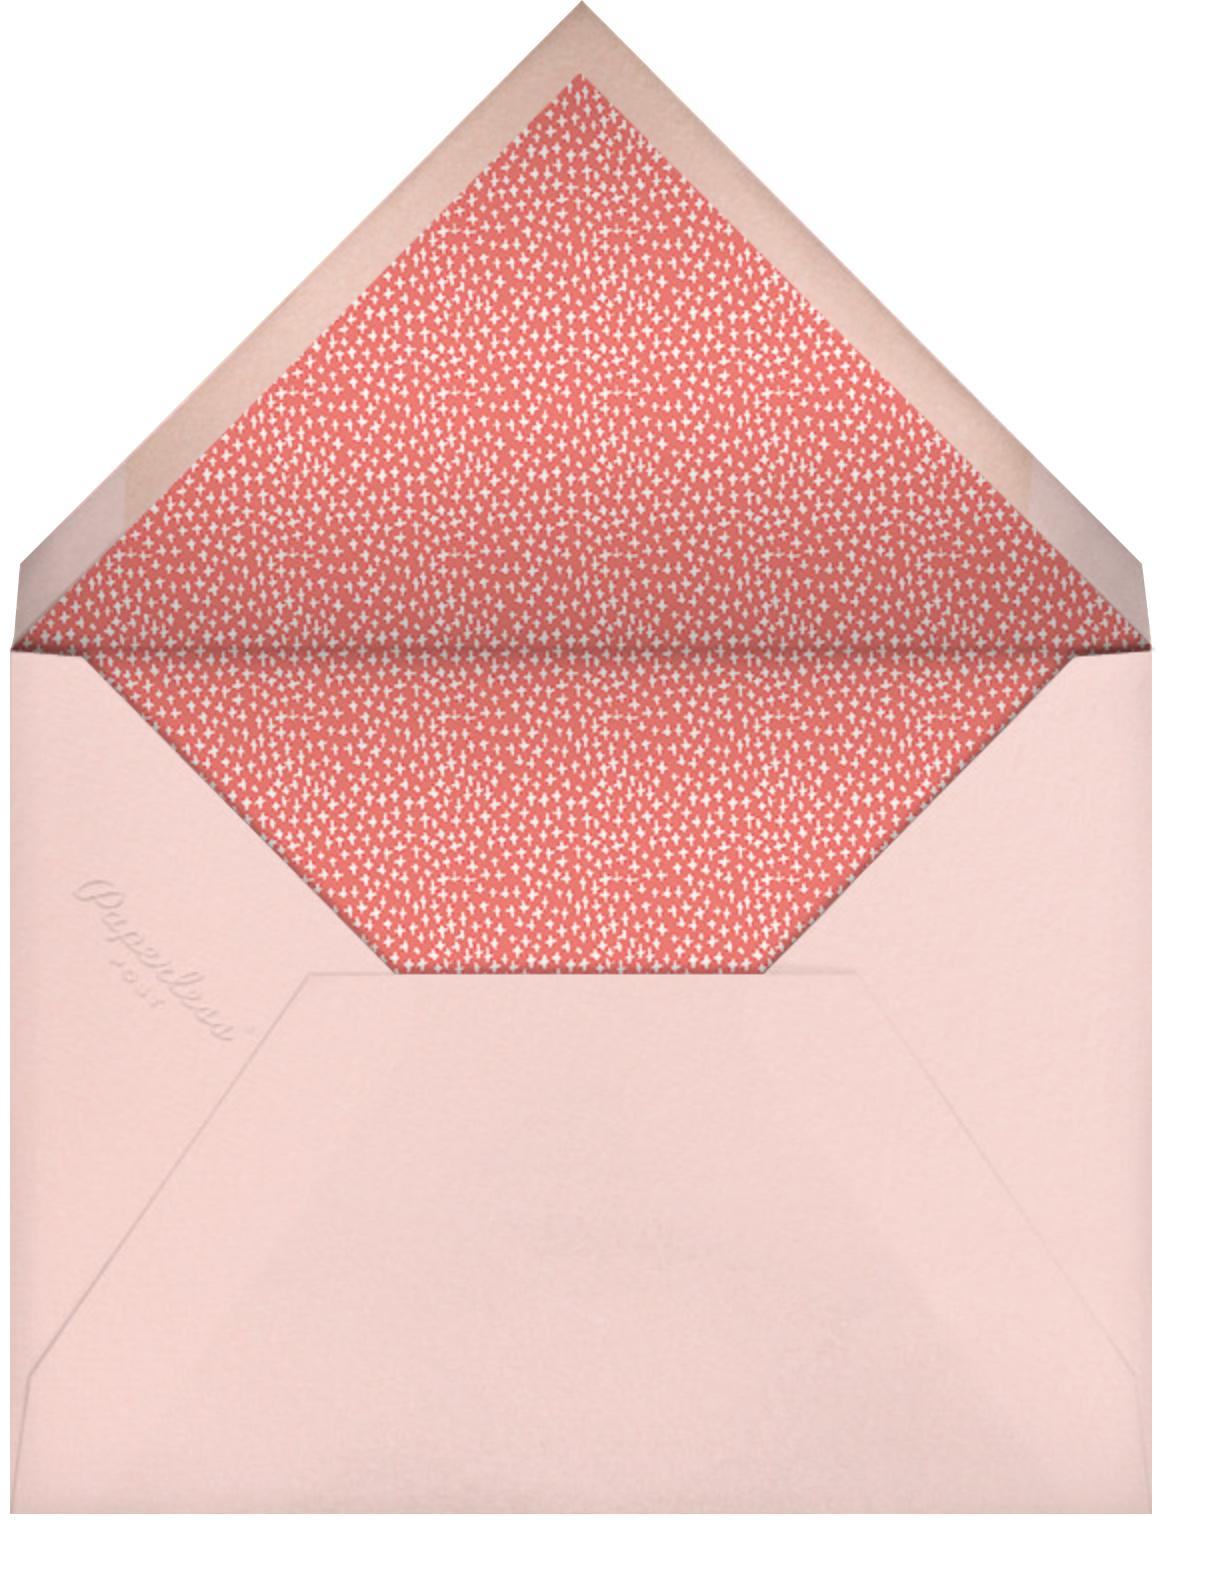 It's So Sticky (Greeting) - Mr. Boddington's Studio - Envelope